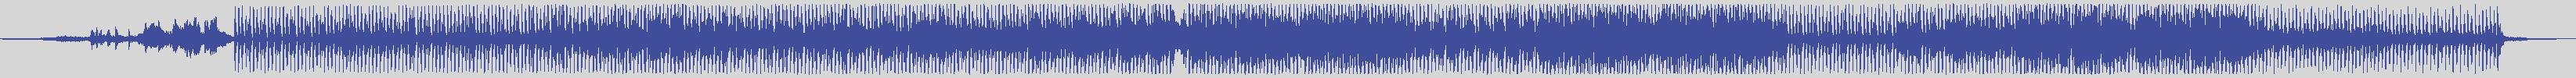 muzik_without_control [MWC001] Jt Company - Love Tende [Classic Version] audio wave form